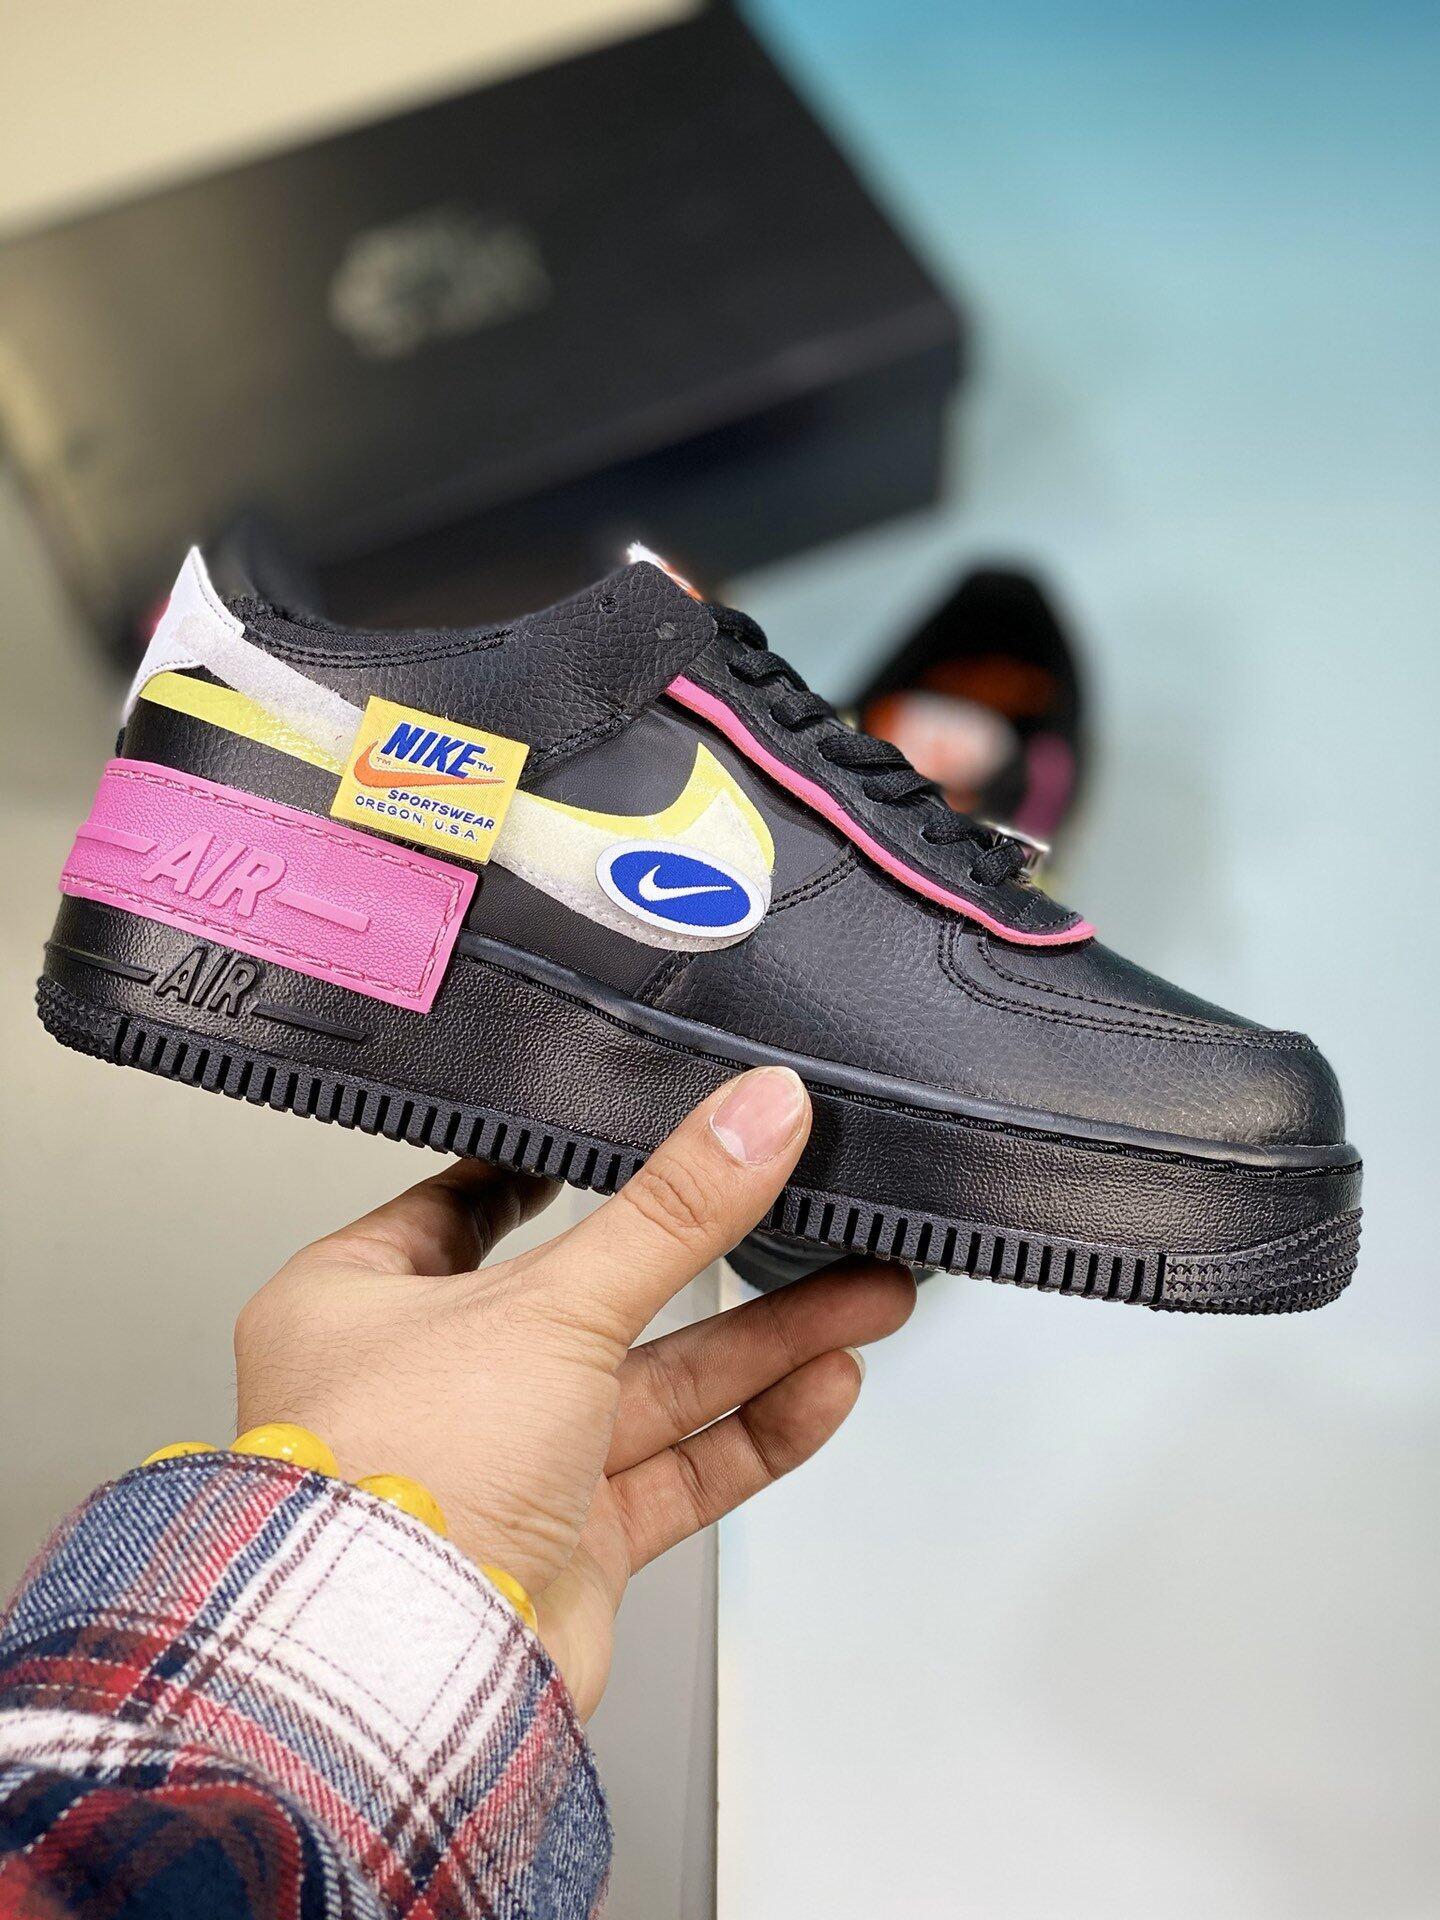 Nike Air Force 1 Shadow Vast Grey Laser Orange Casual Shoes Woman Black Lazada Nike air force 1 shadow triple white weiß eu 36,5 ✅deadstock✅. lazada